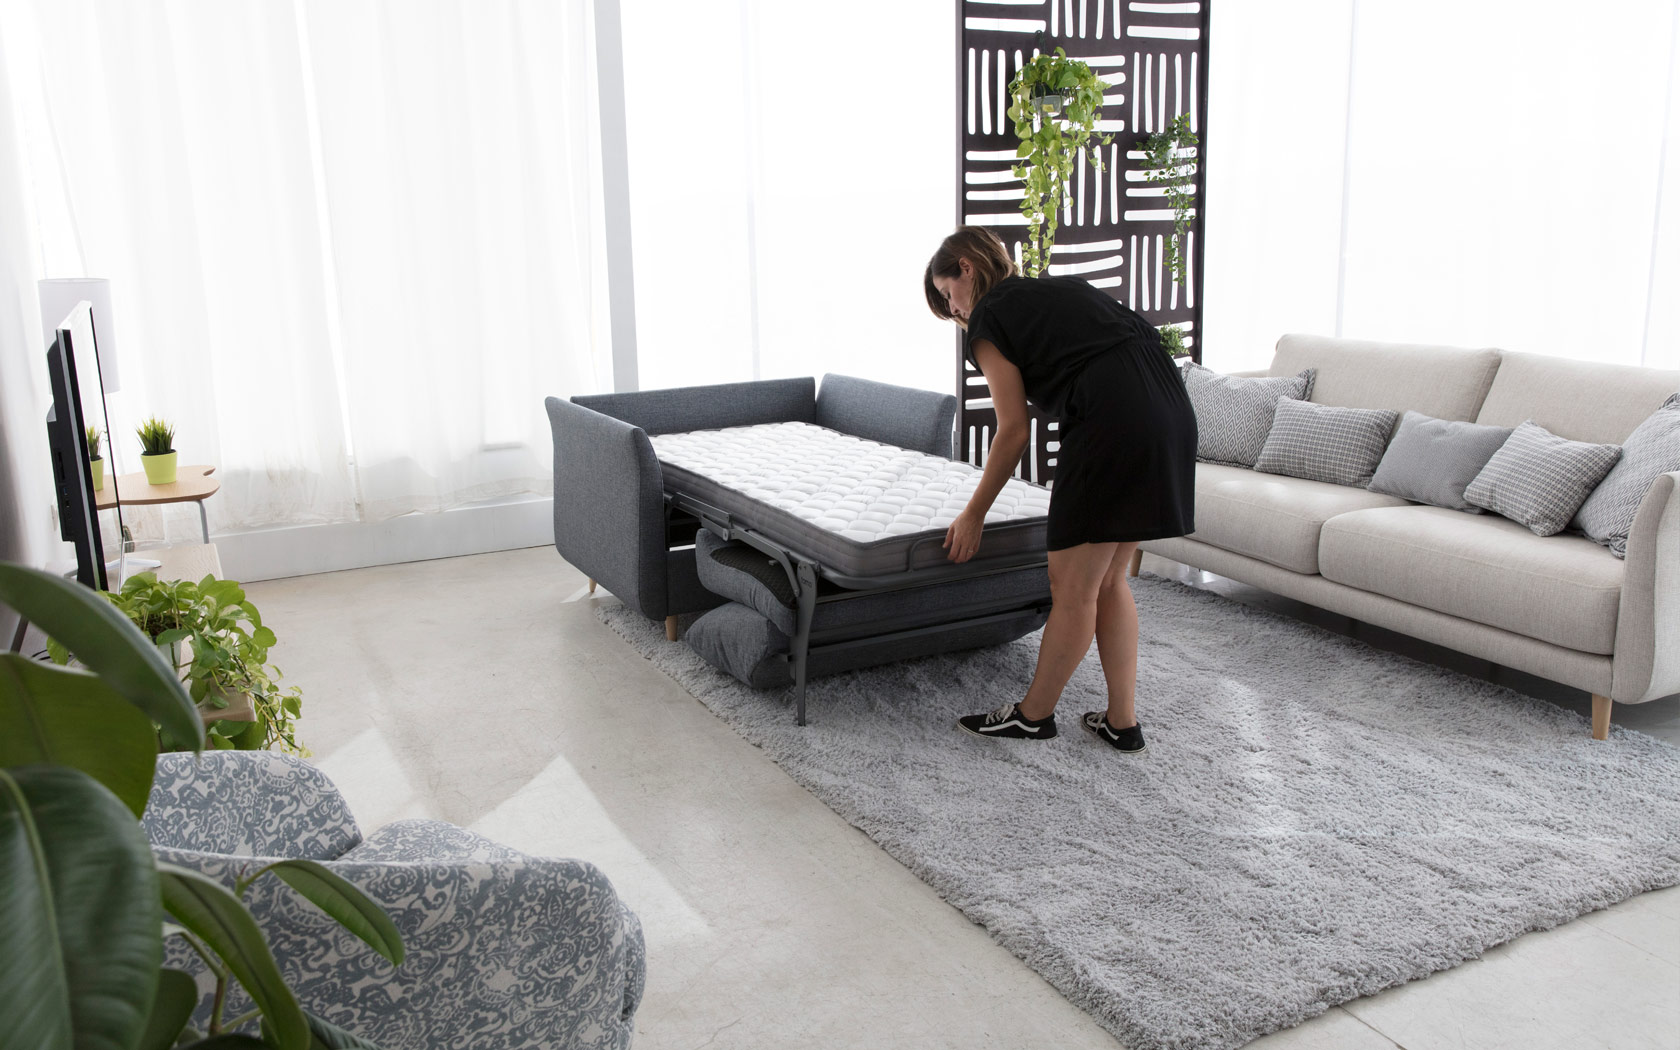 Helsinki sillón cama 2020 03